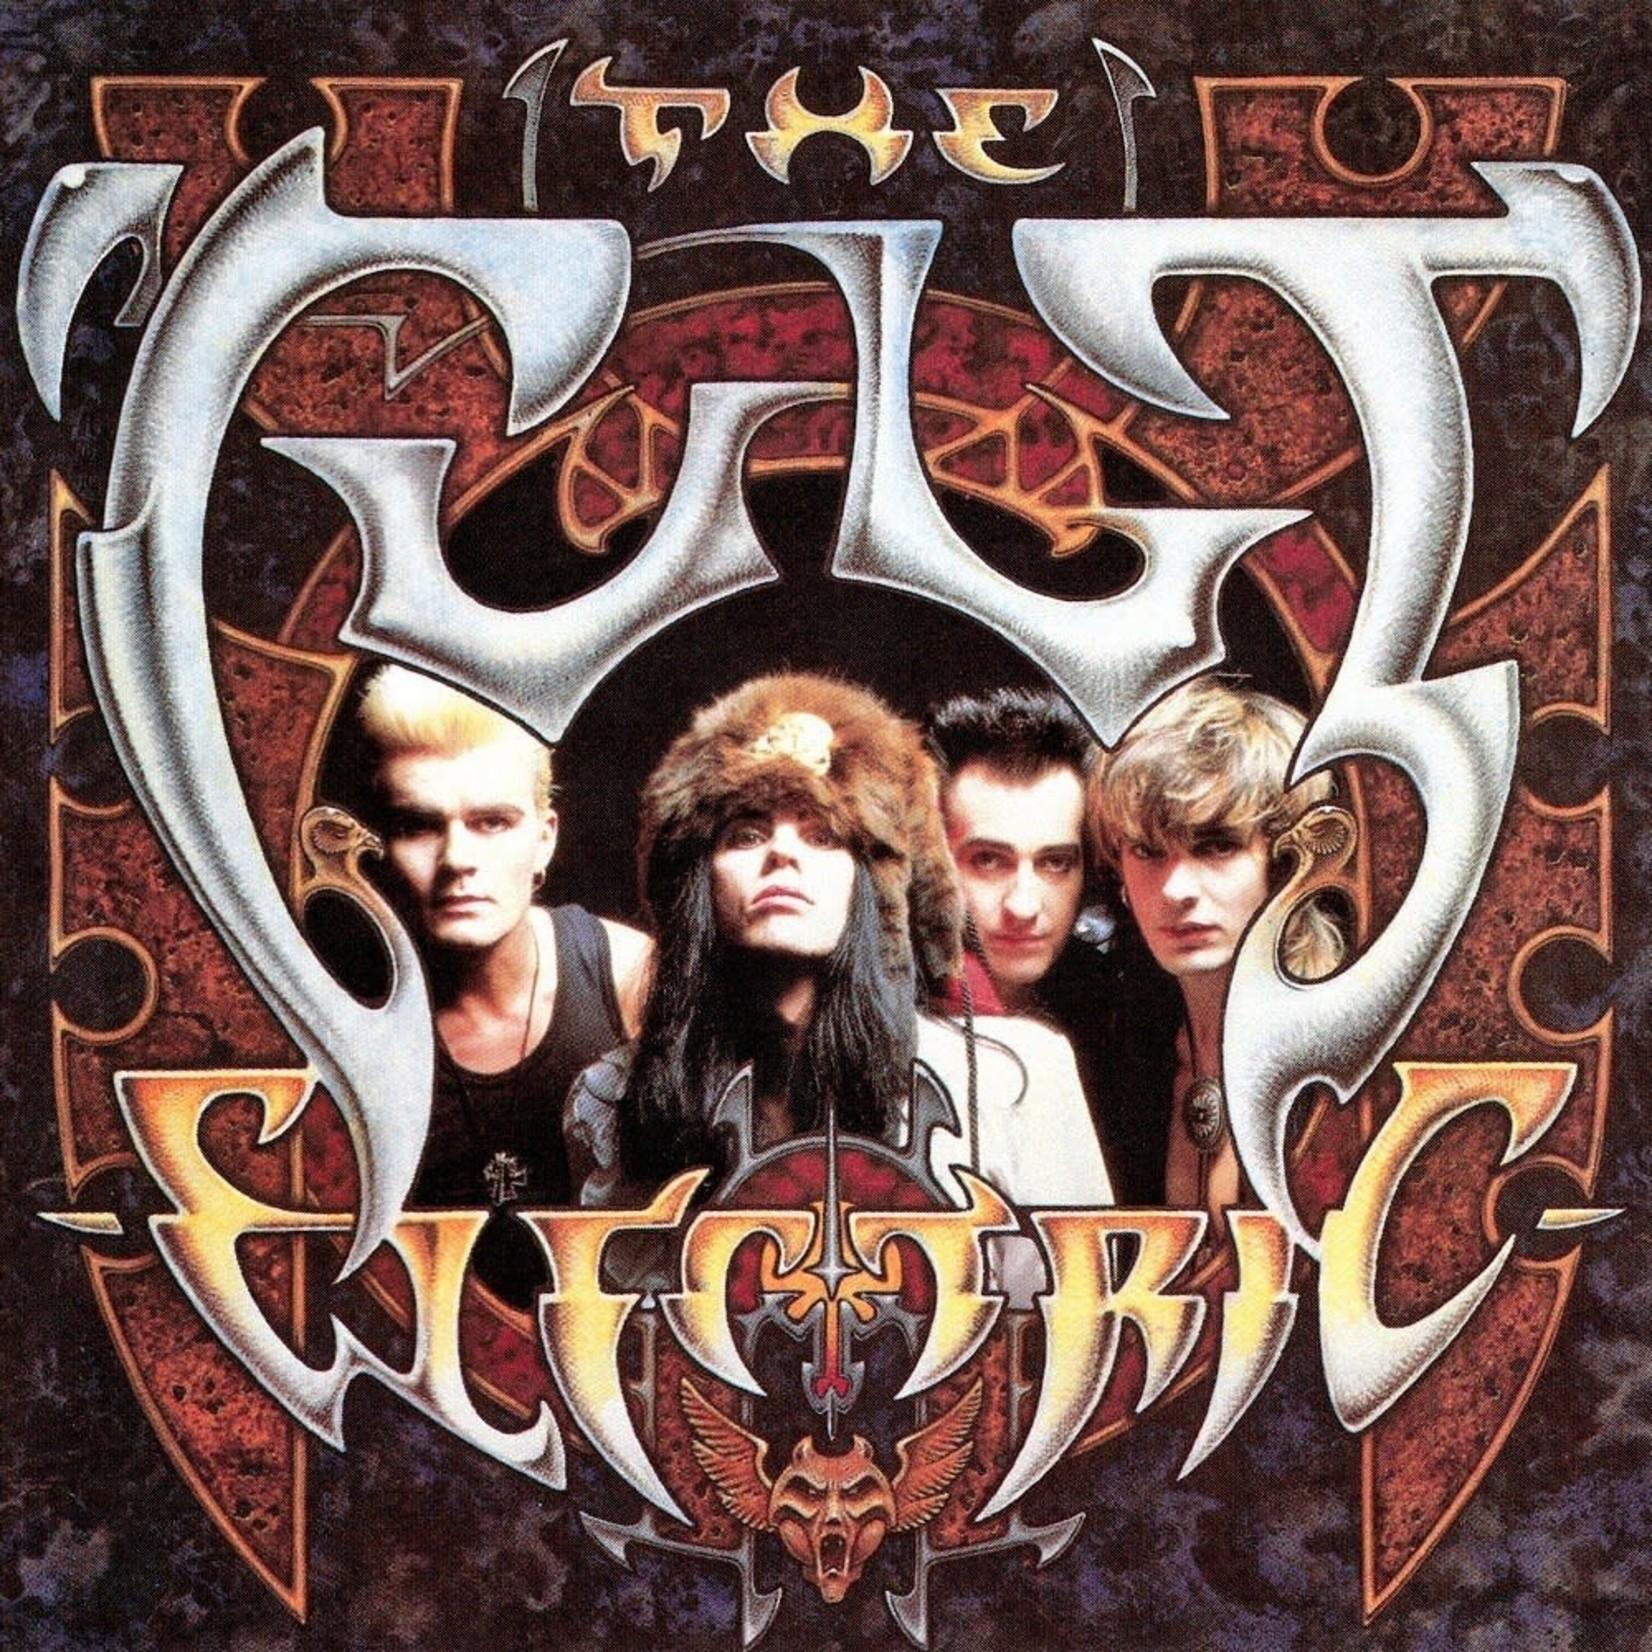 [Vintage] Cult: Electric